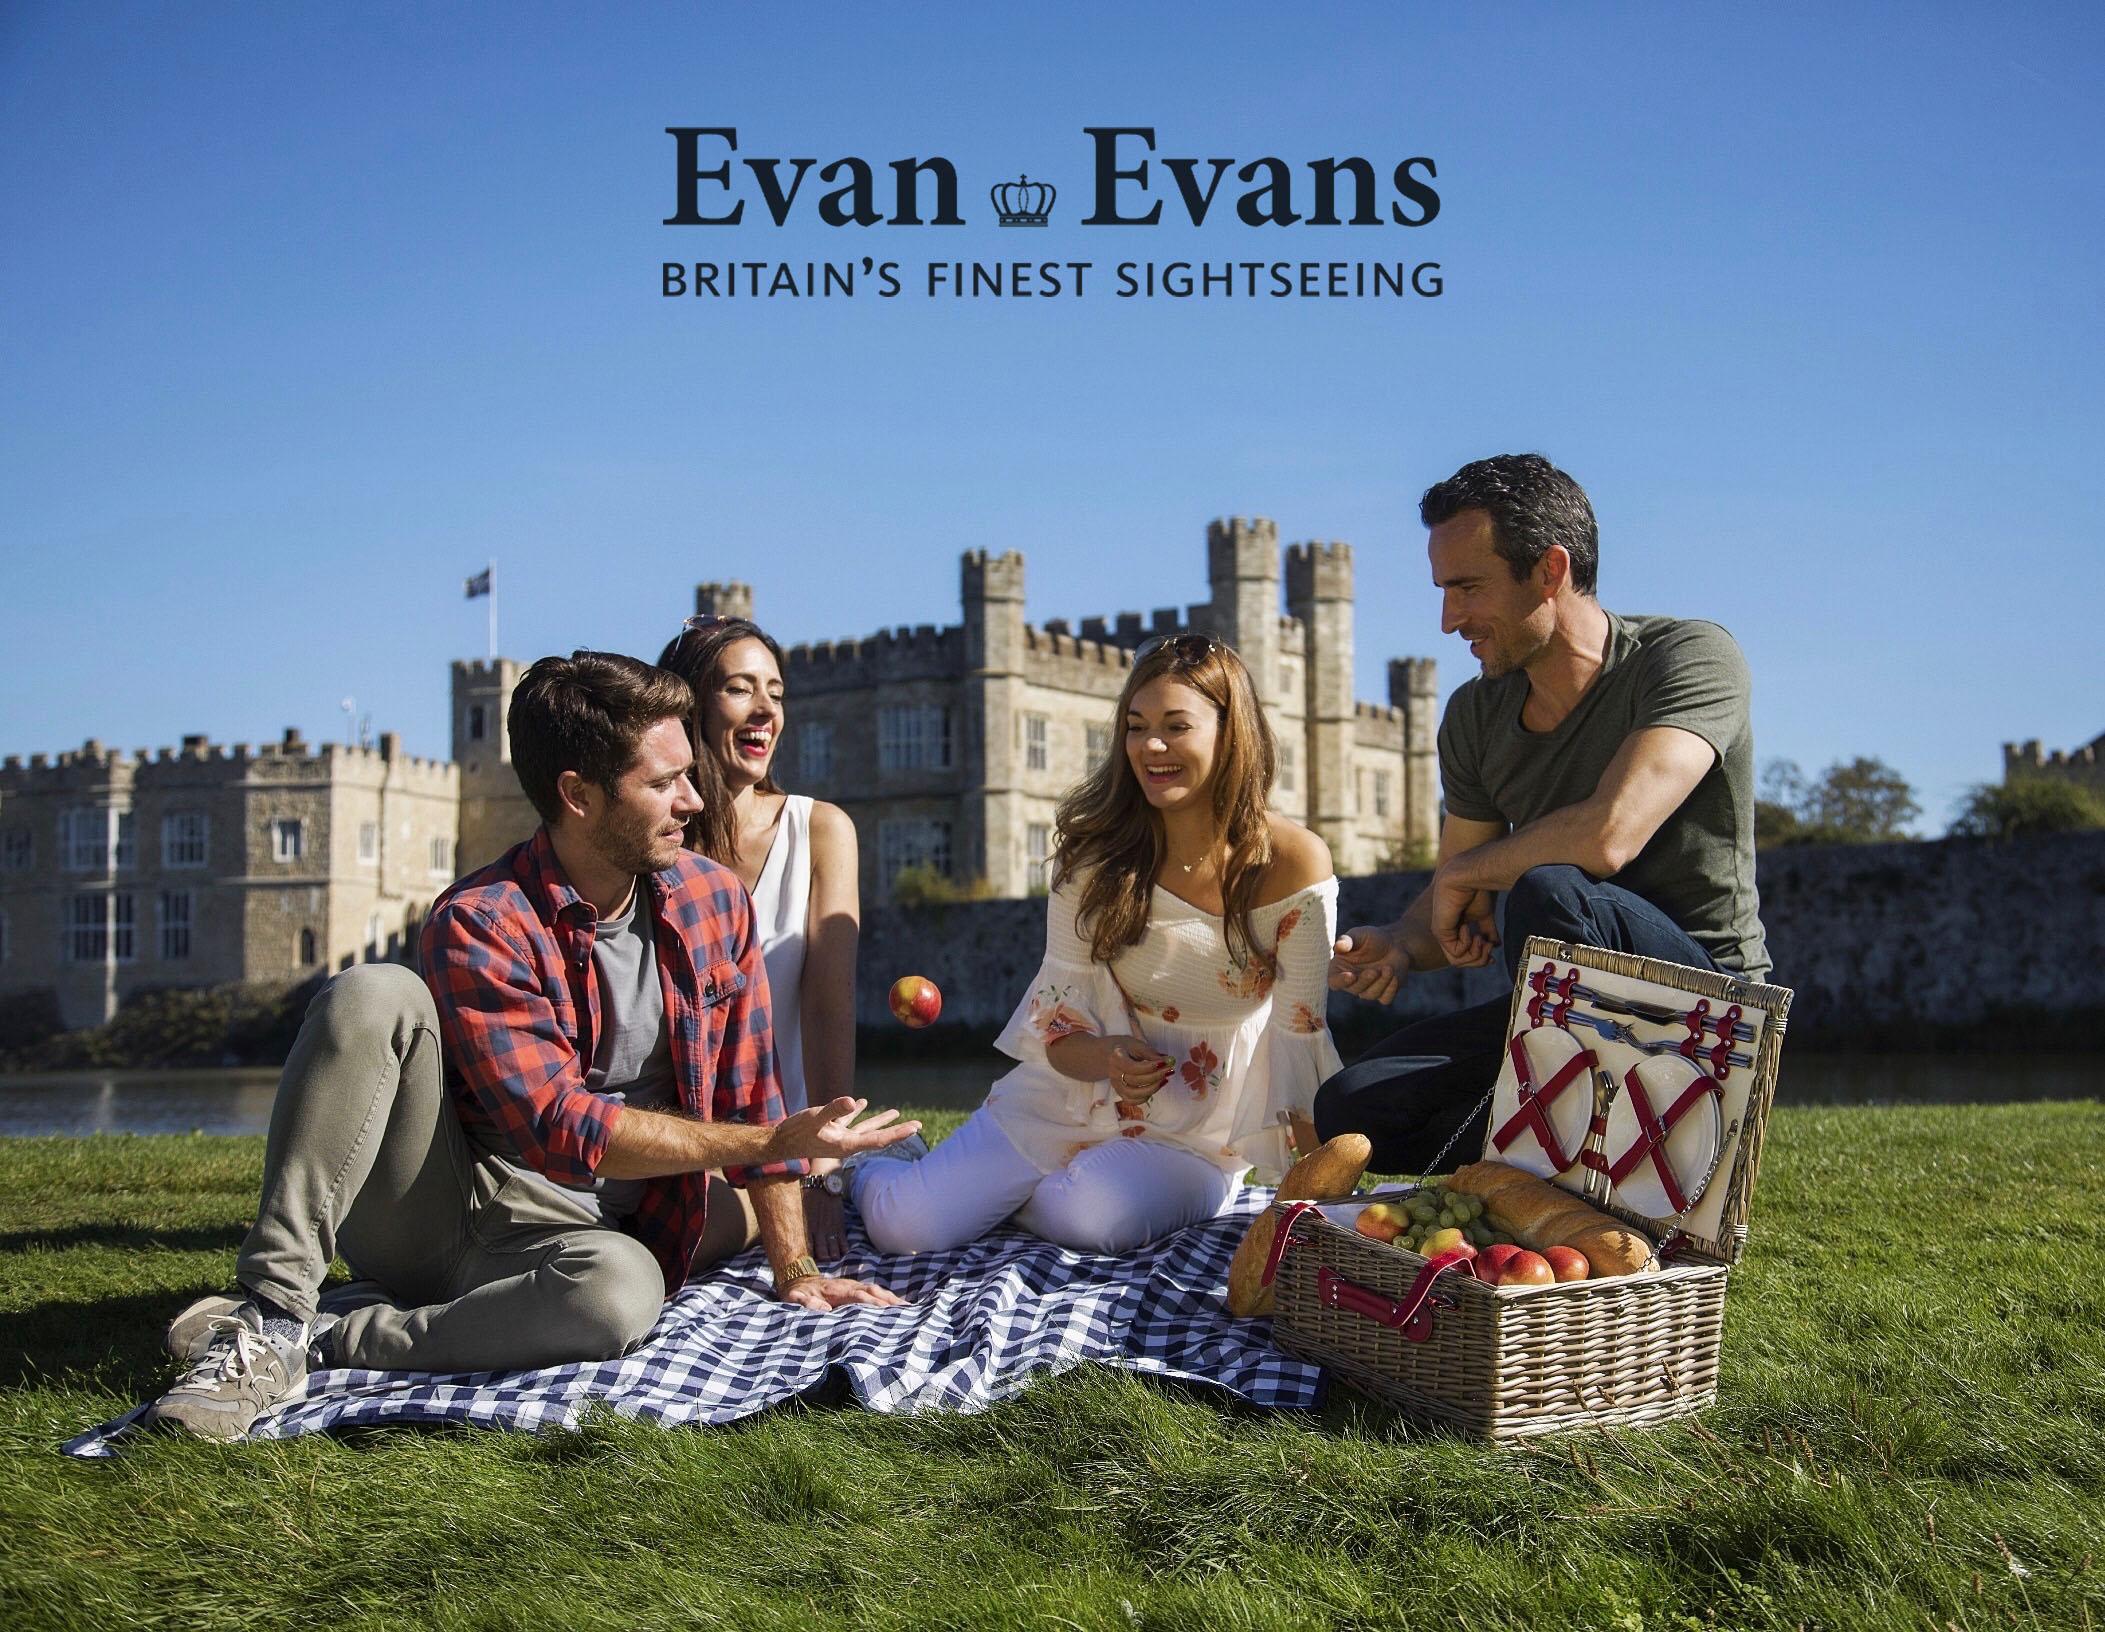 Shoot for Evan Evans Tours